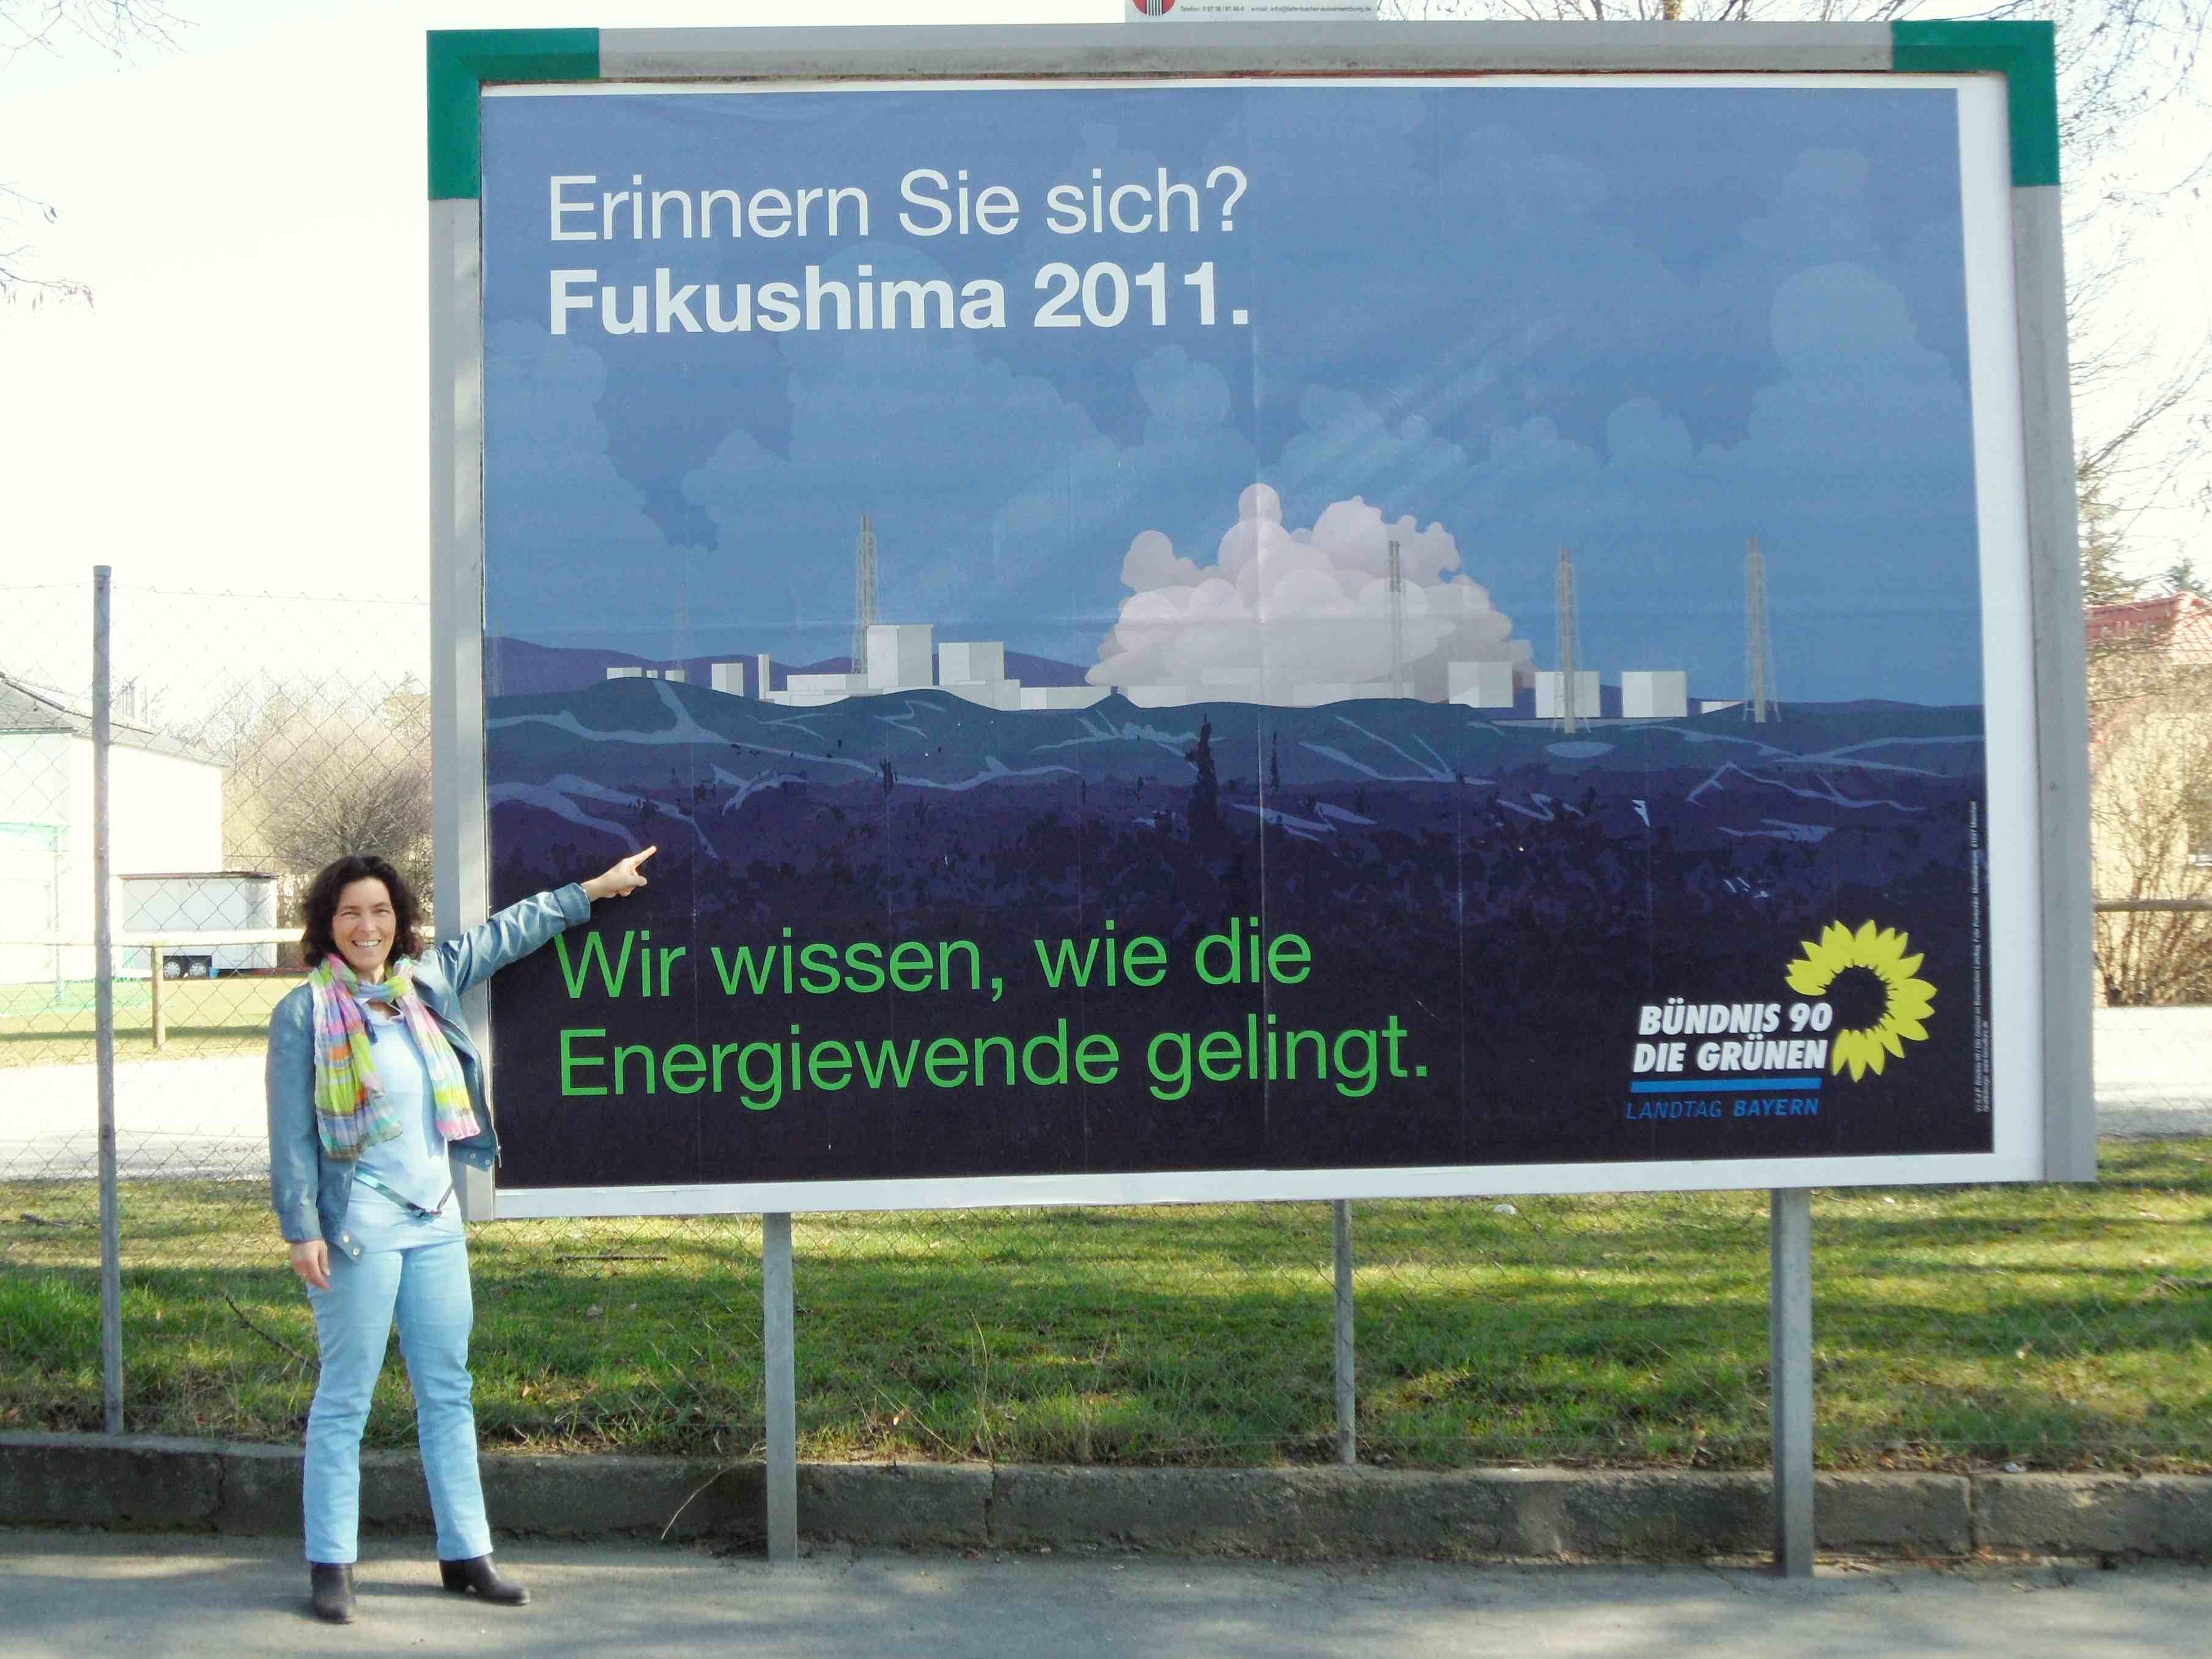 Damit Fukushima nicht in Vergessenheit gerät! Kerstin Celina vor dem Plakat in Kitzingen